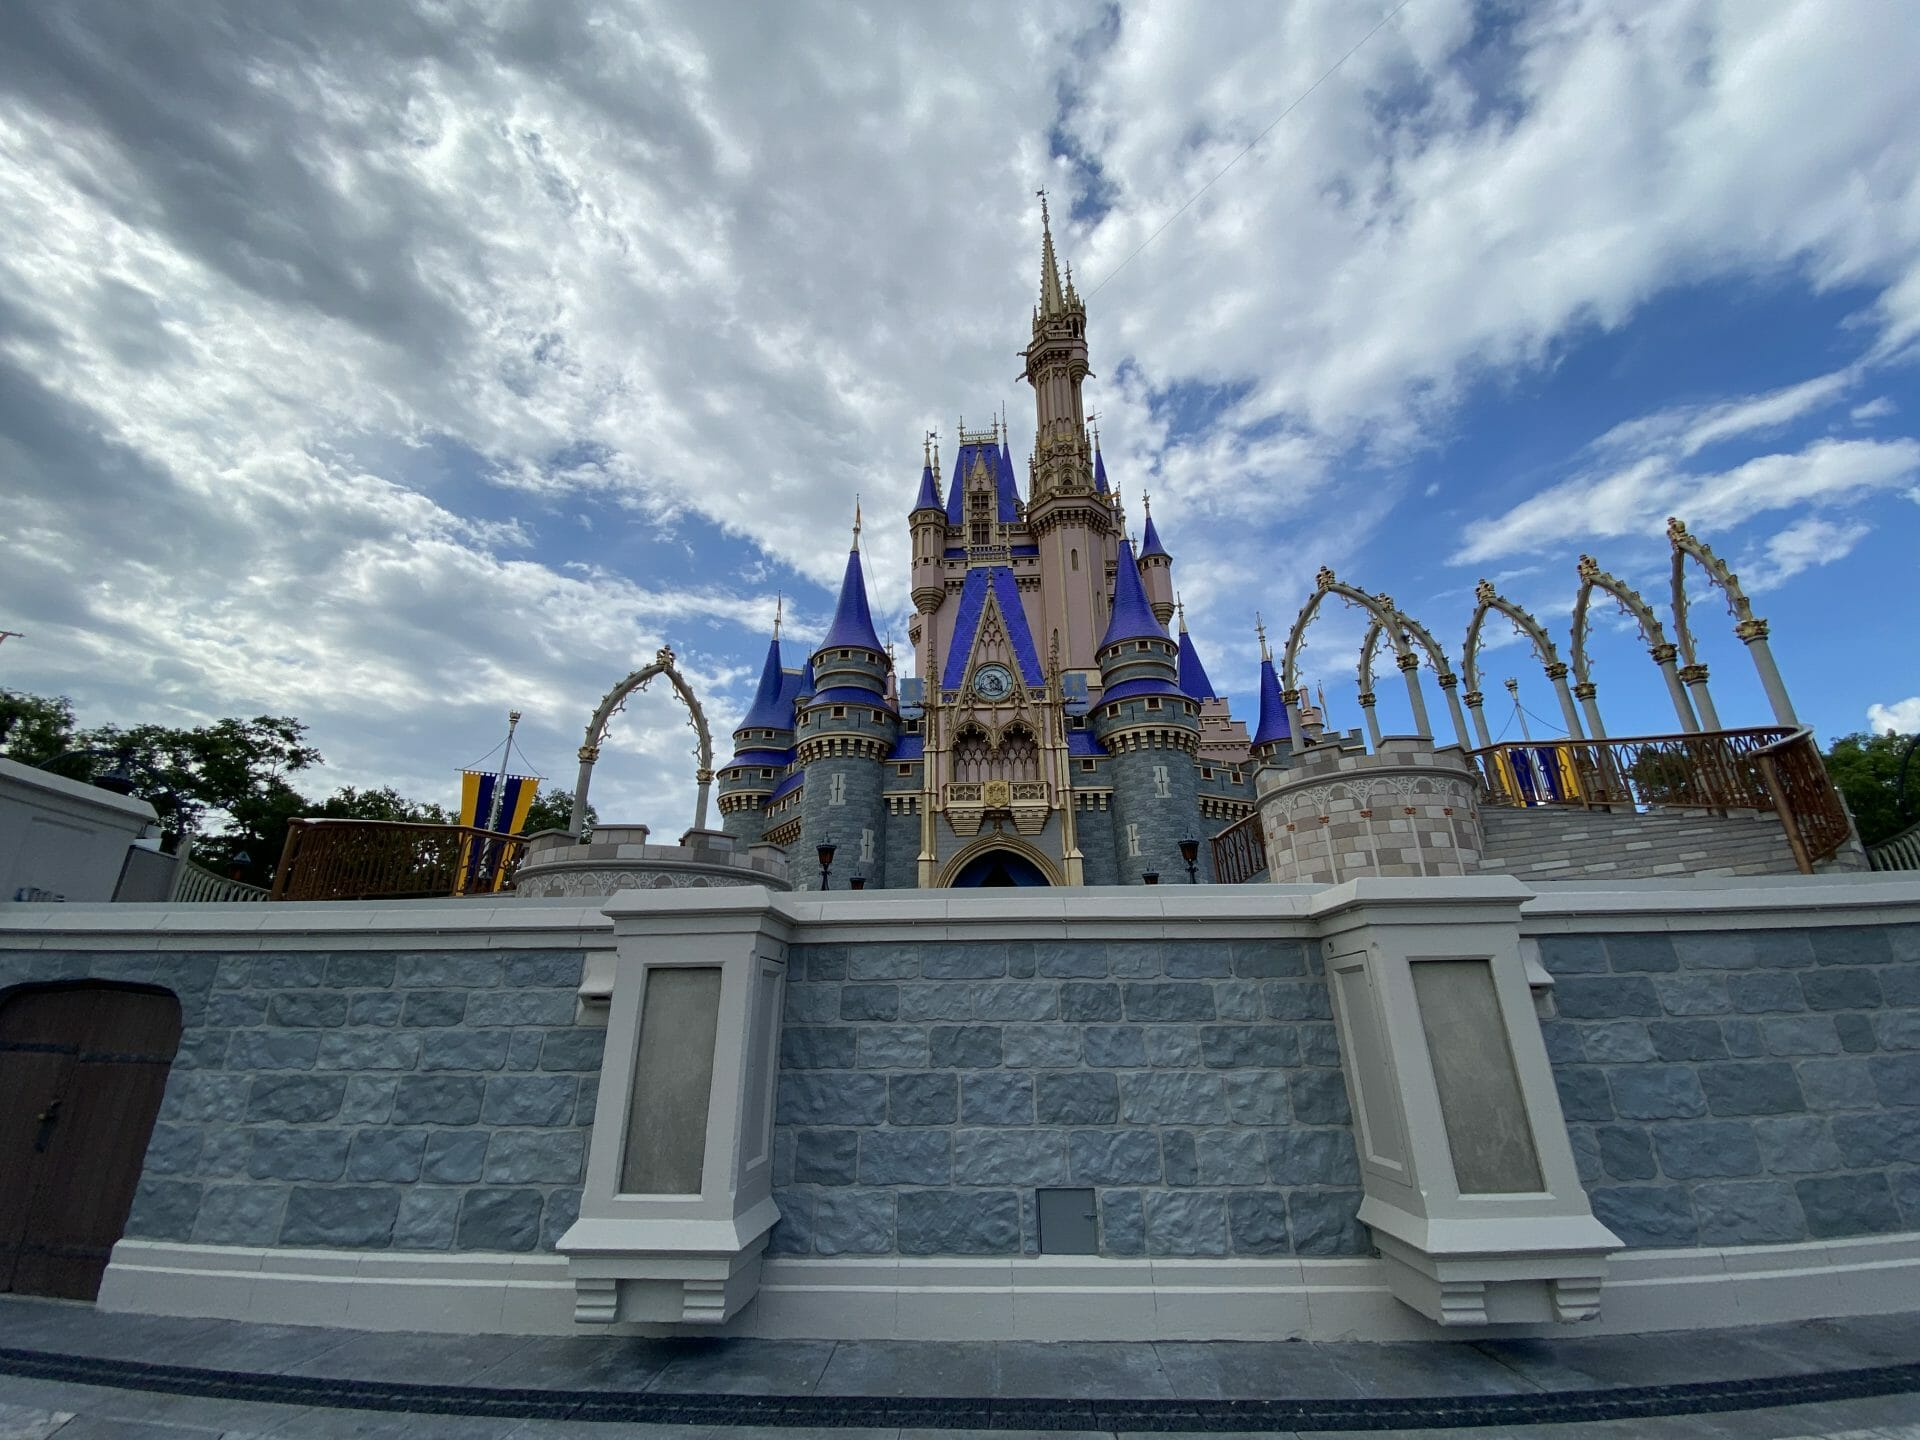 Tips for Saving Money on a Walt Disney World Vacation